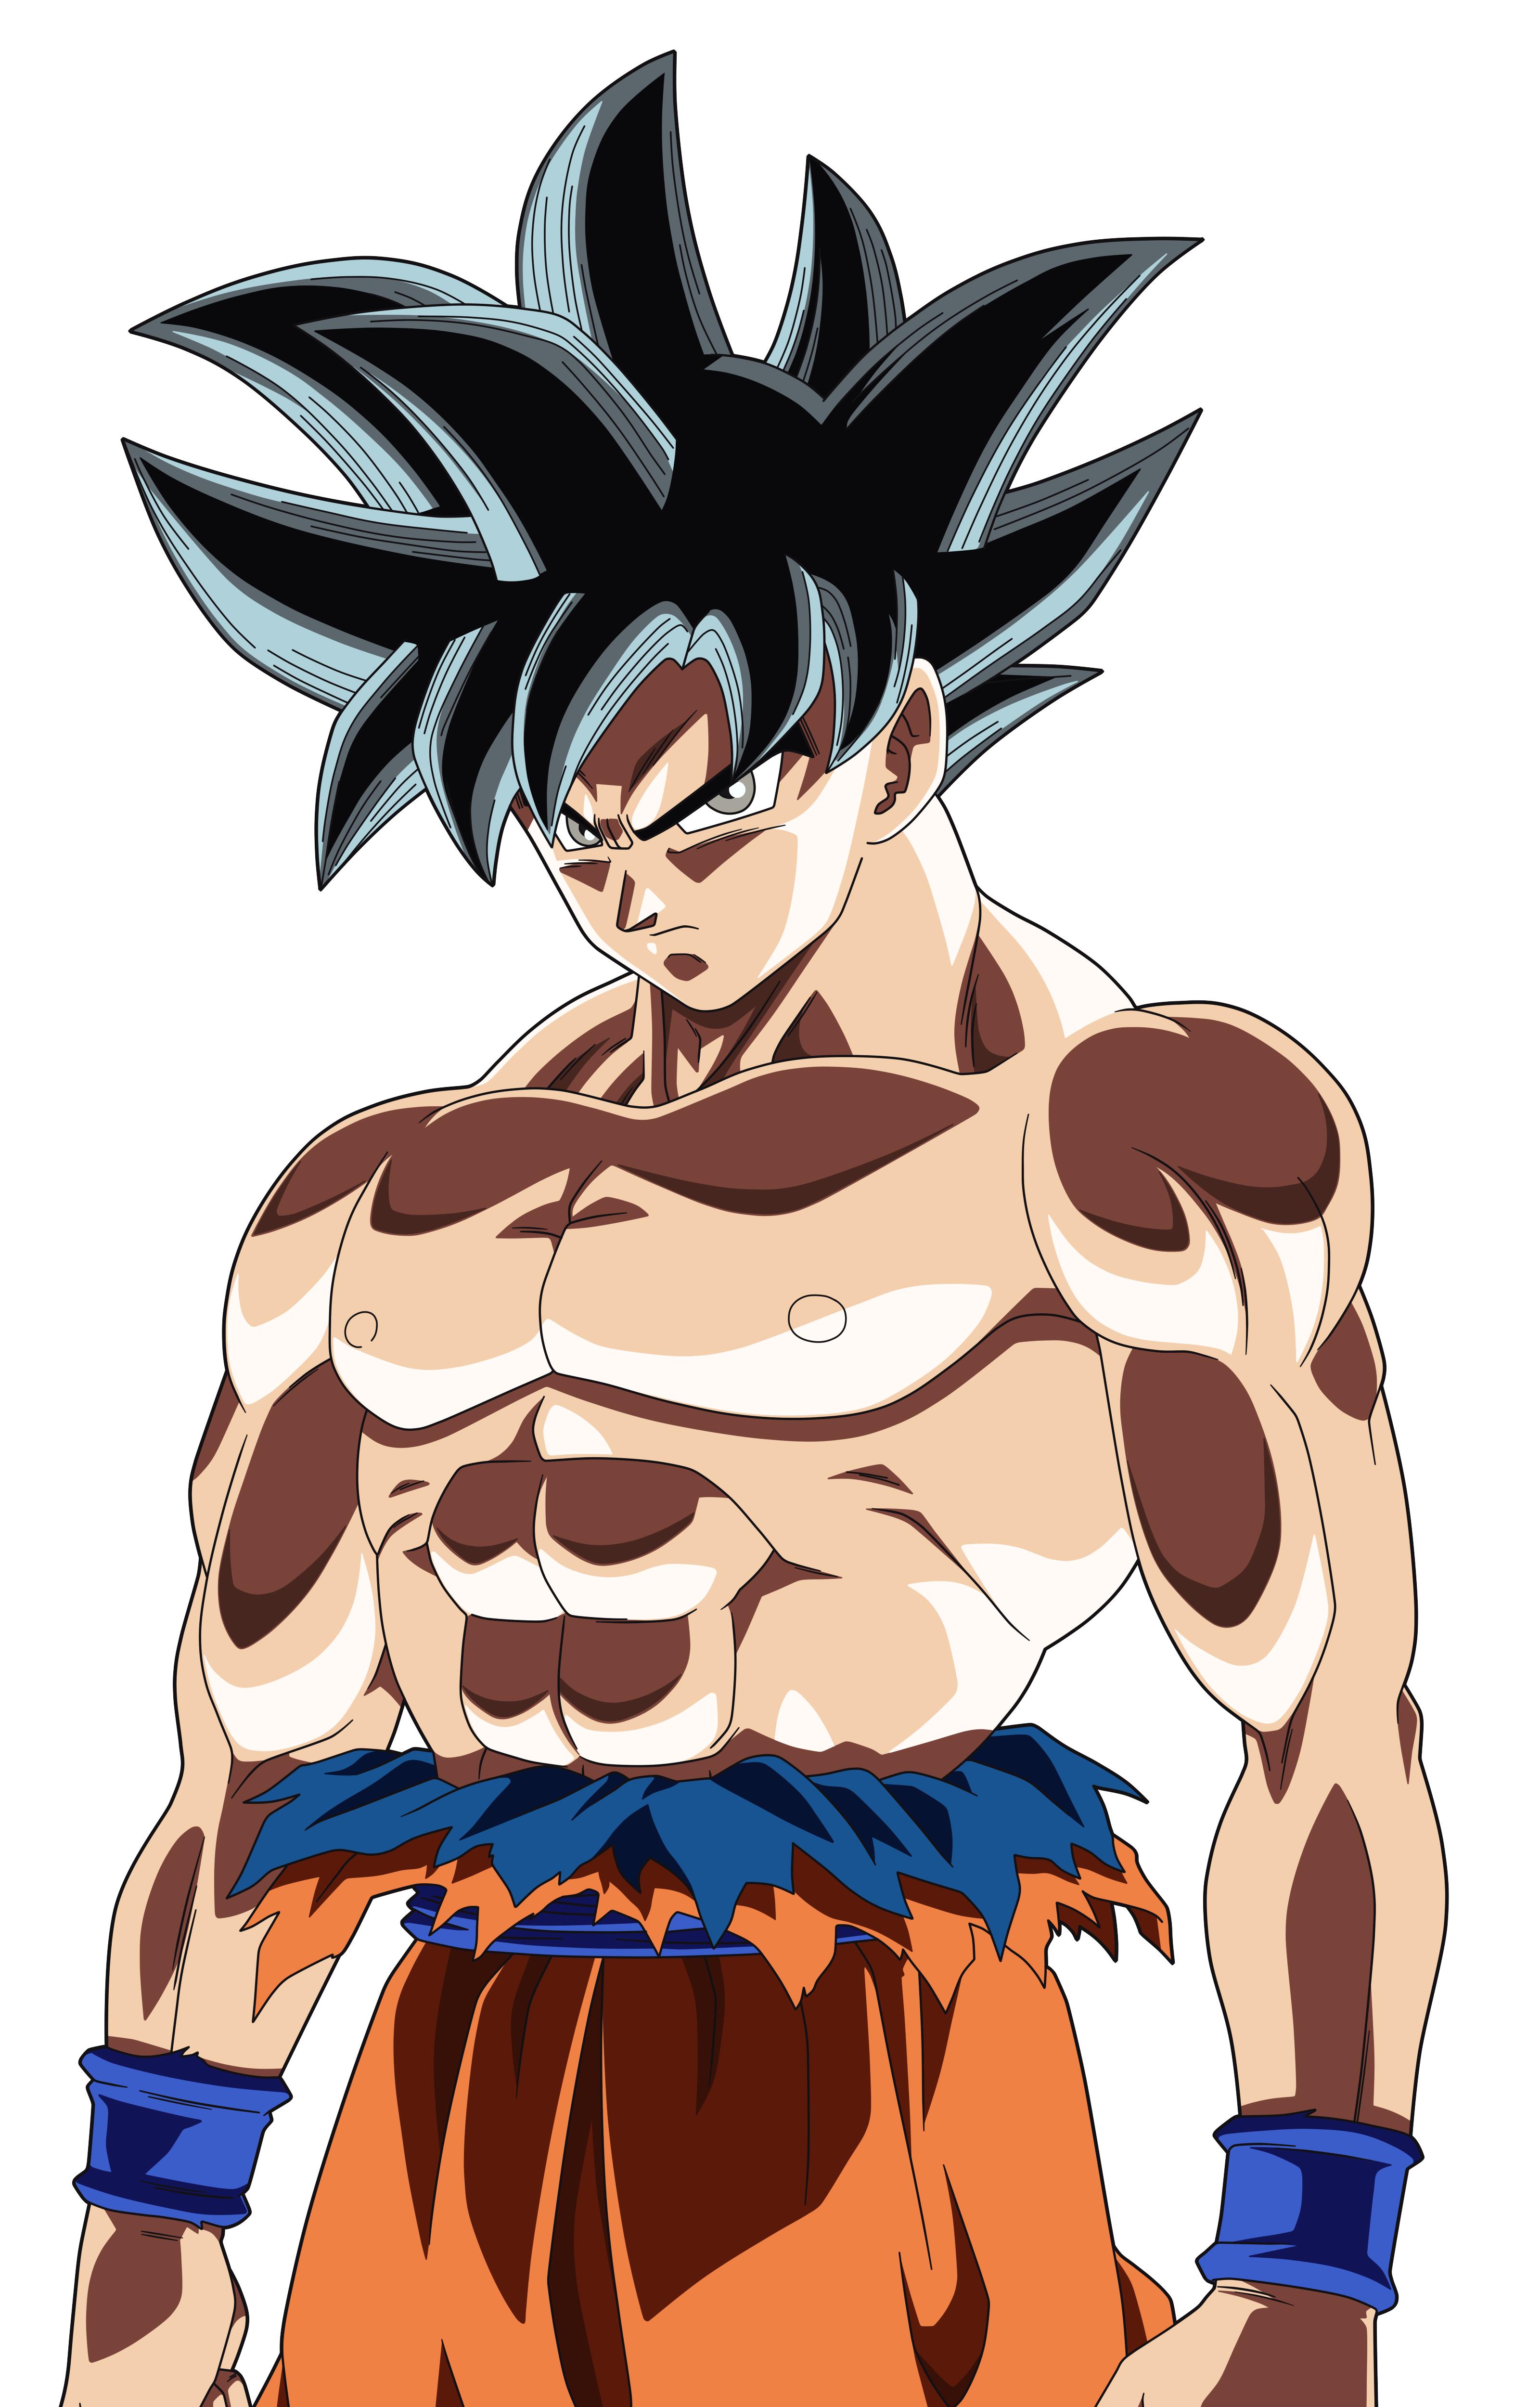 Goku Limit Breaker Personajes De Dragon Ball Personajes De Anime Dragones